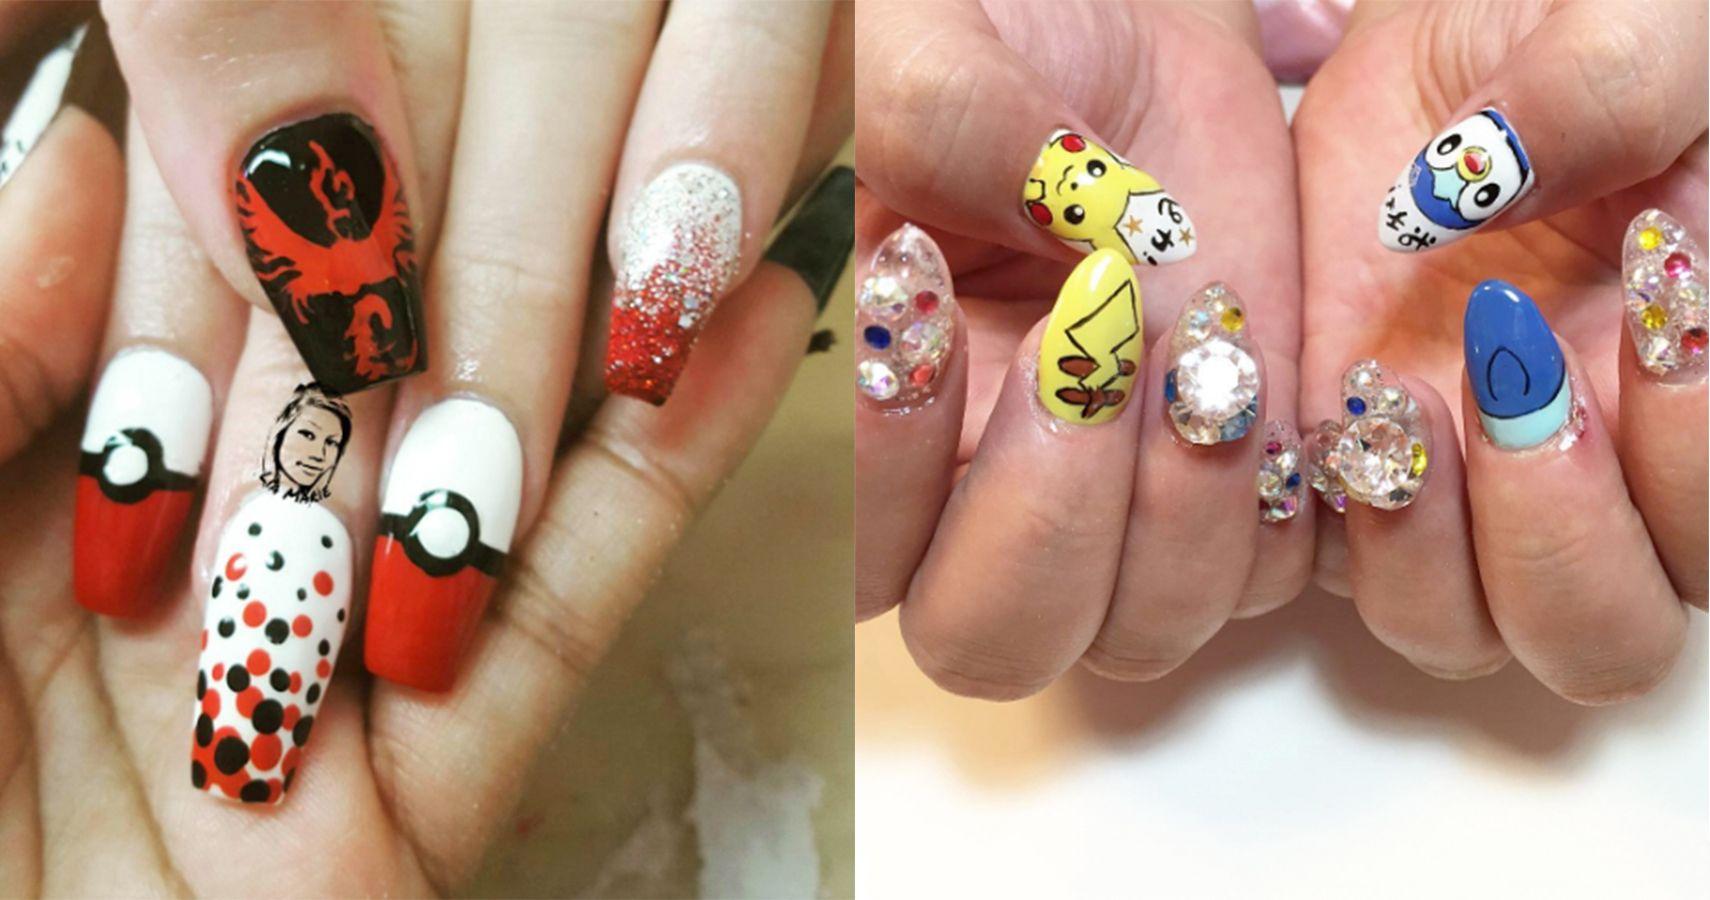 15 Pokémon Nails that Will Seriously Up Your Pokémon GO Game